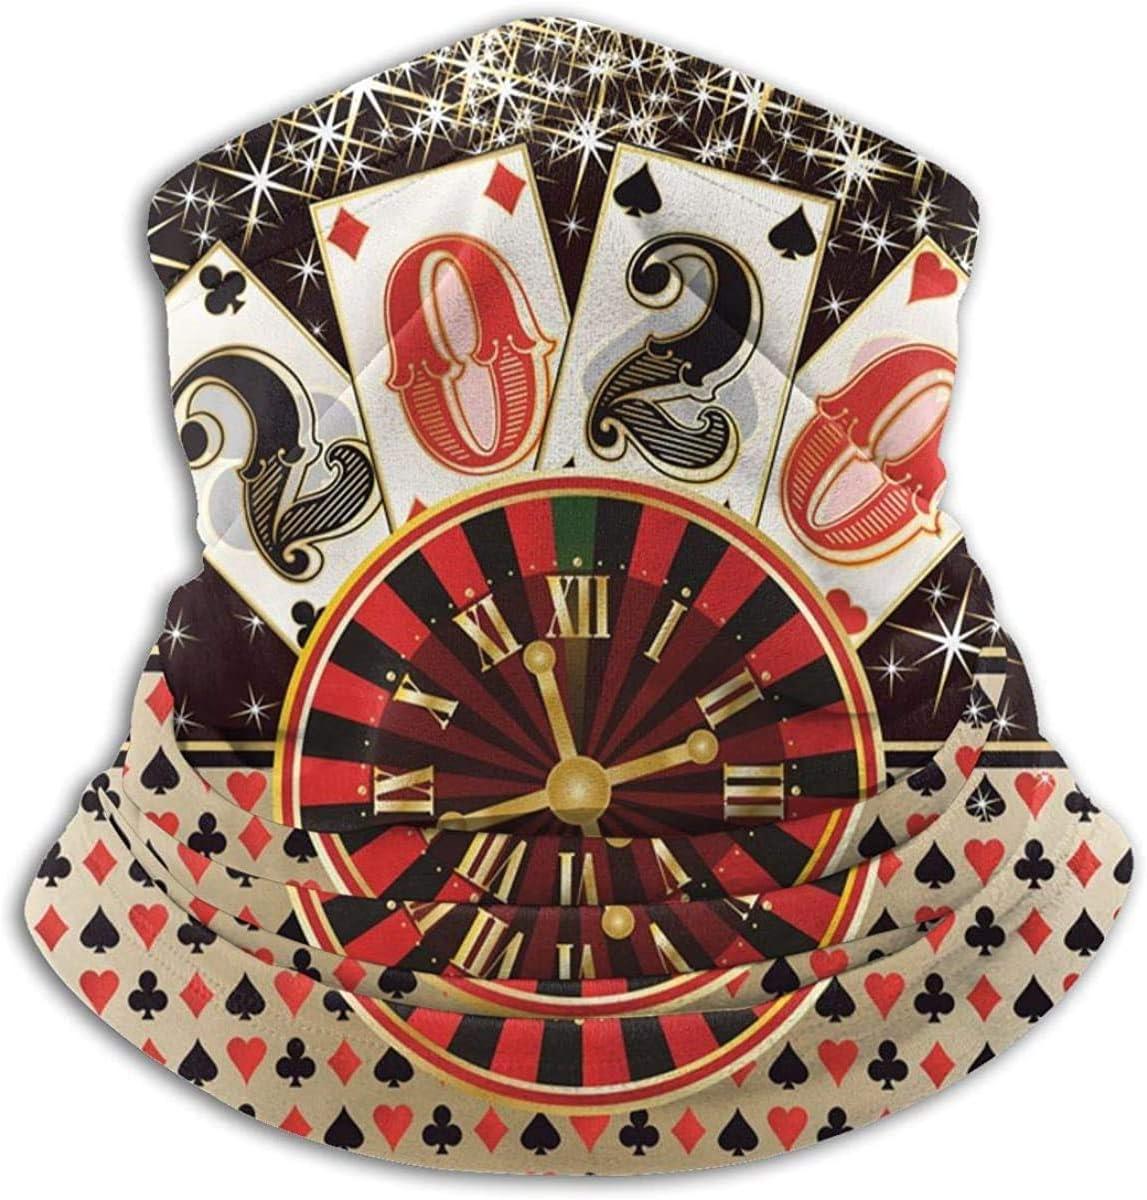 Lastbest Christmas Poker Casino New 2020 Year Neck Warmer Multifunction Scarf Hat Neck Gaiter Neck Cap Bala Windproof Neck Heating Wrap Outdoor Sports One Size